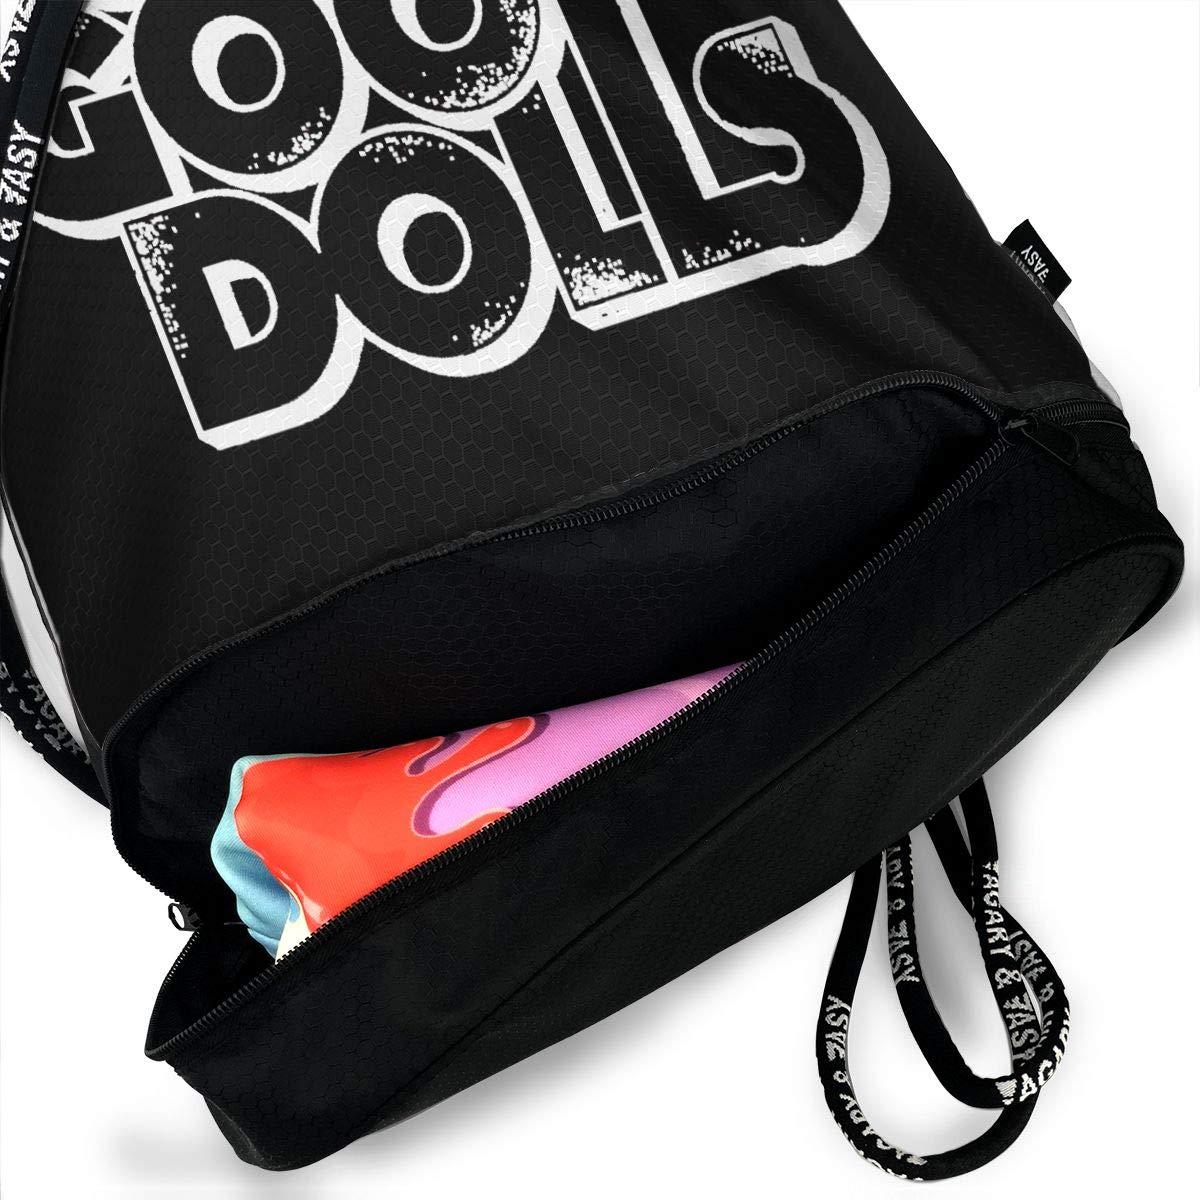 Sport Gym Travel Bag AgoodShop Goo Goo Dolls Band Logo Drawstring Backpack